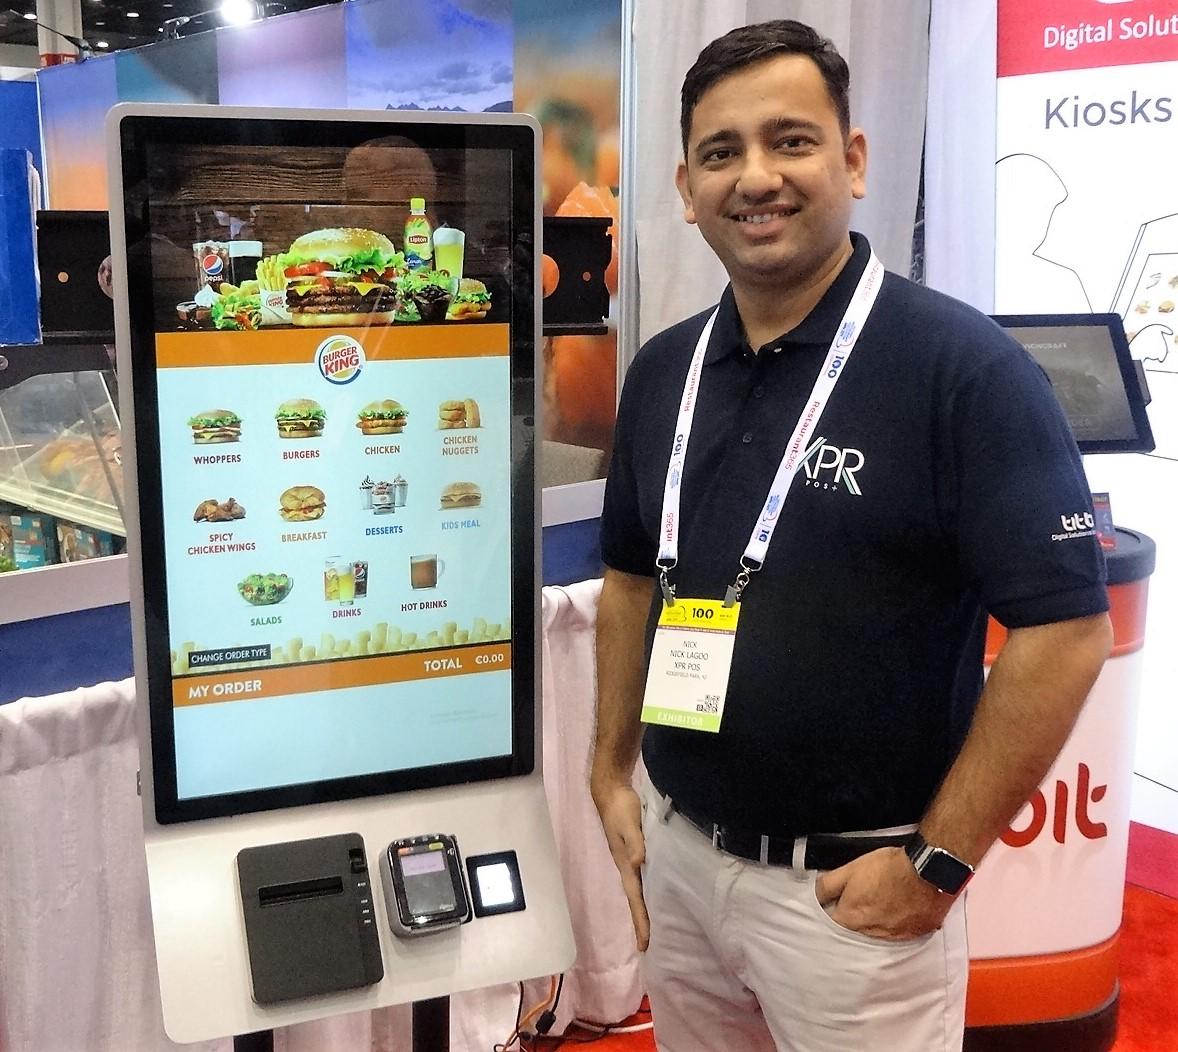 Kiosk Marketplace editor reviews 39 kiosk companies at